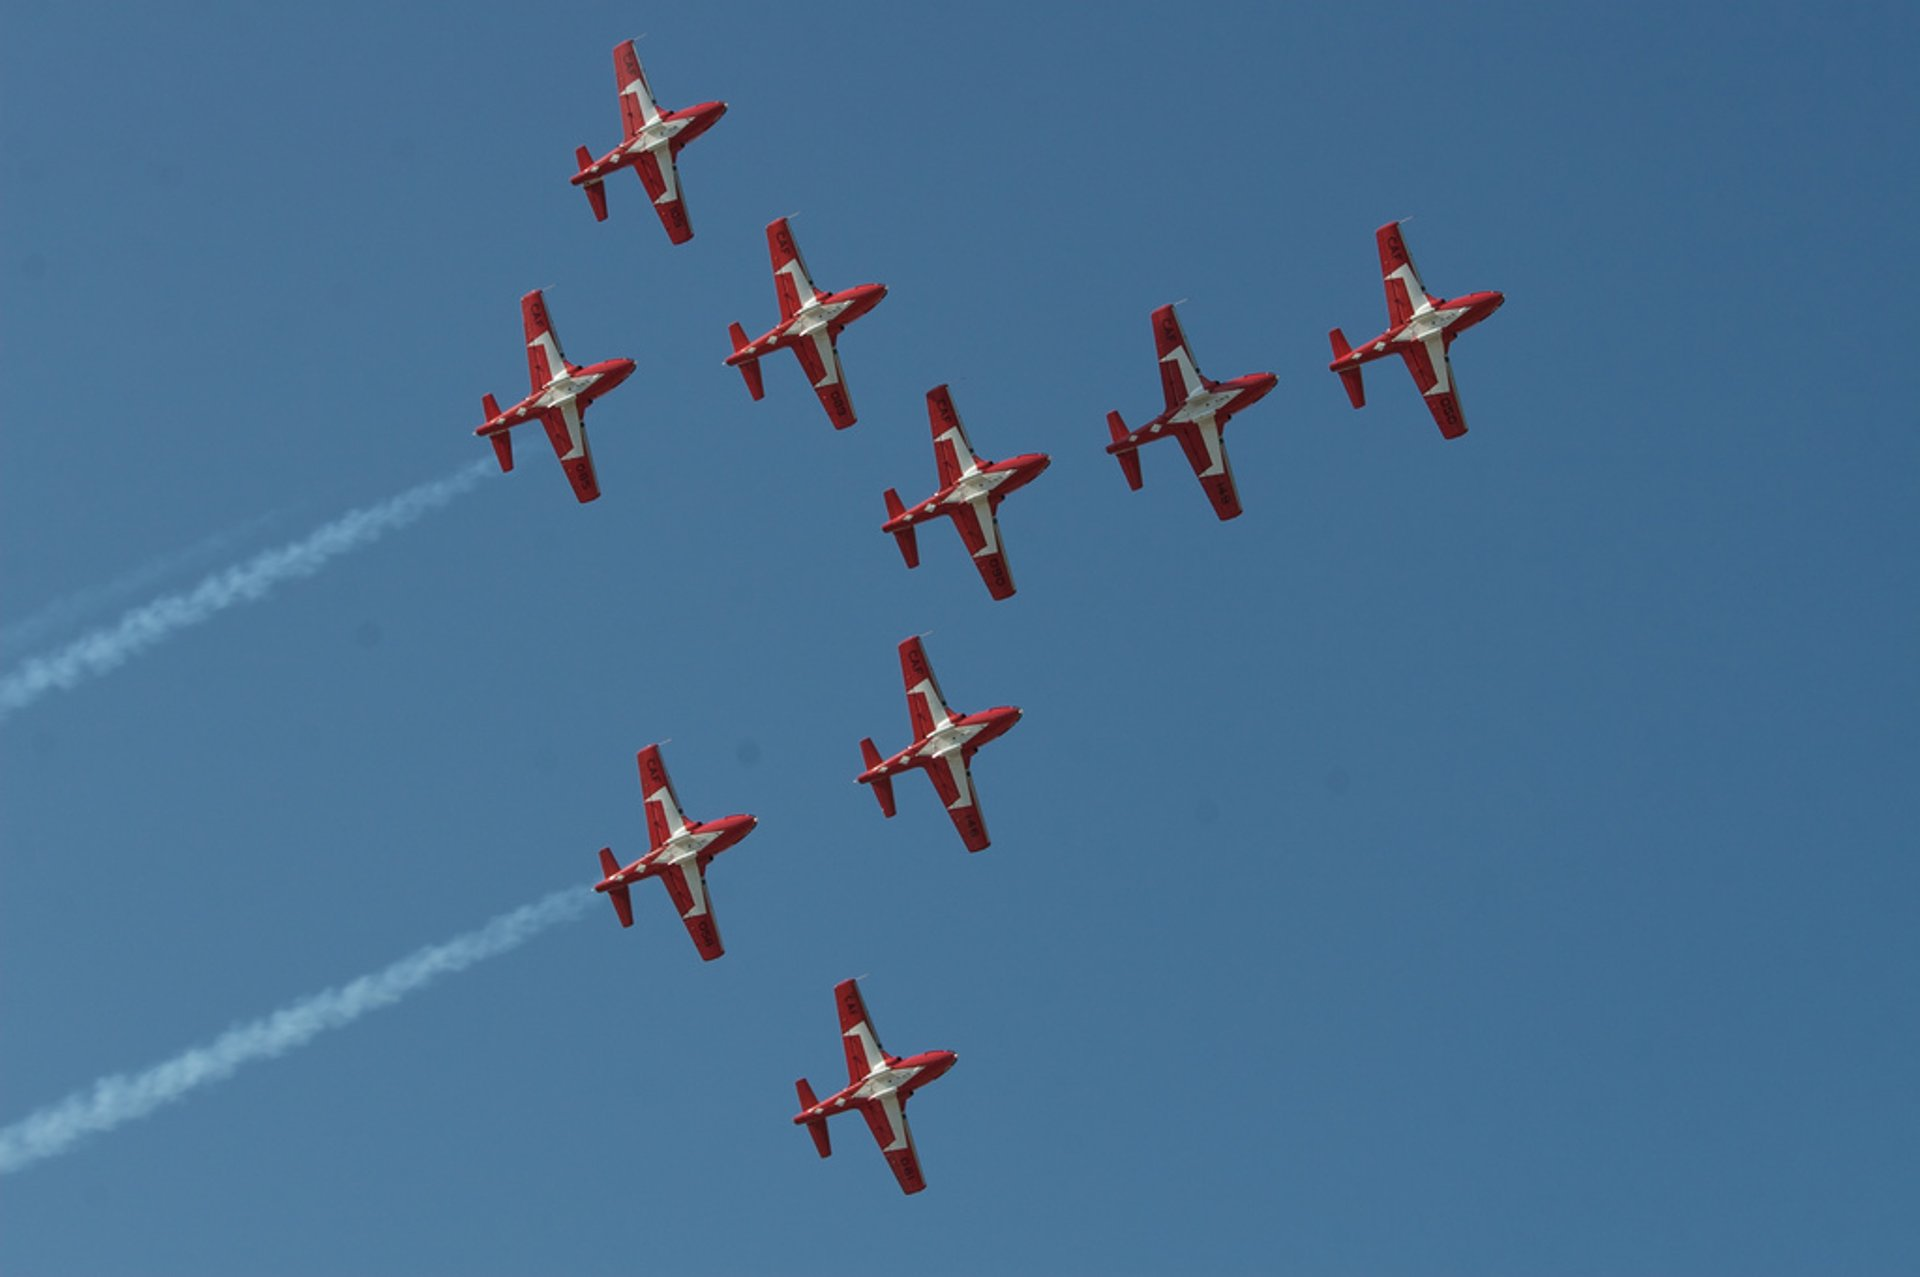 Edmonton Airshow in Edmonton 2020 - Best Time